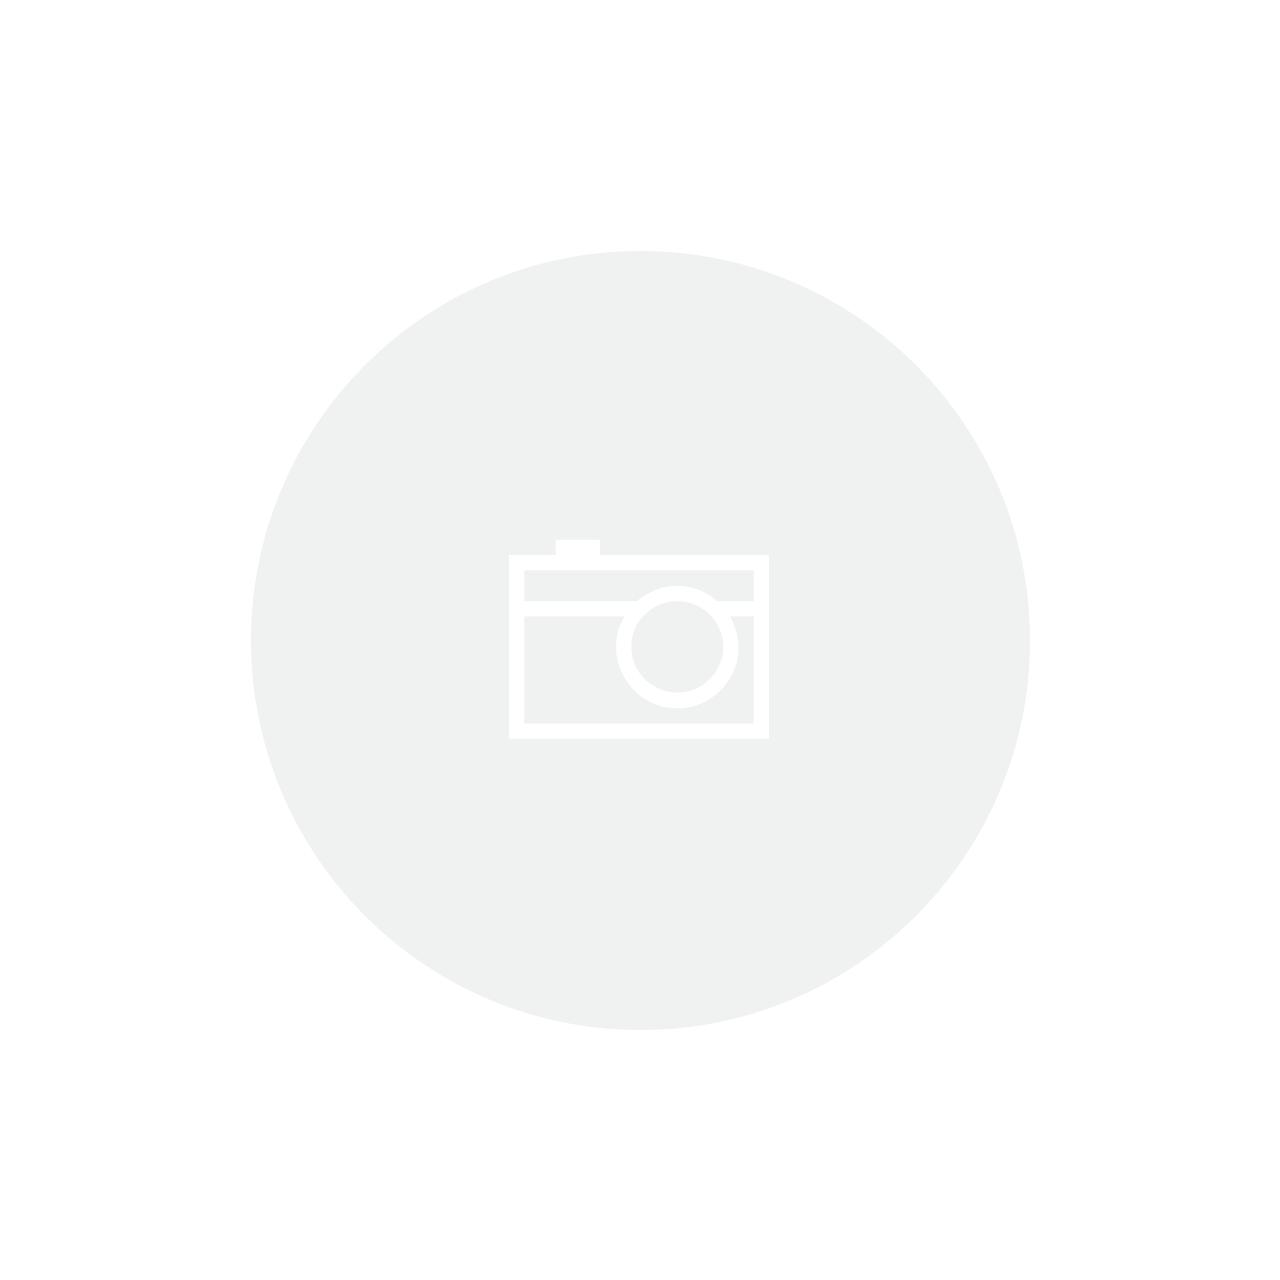 COROA 30D ICTUS NARROW WIDE BCD 94/96mm 4 FUROS (12V)